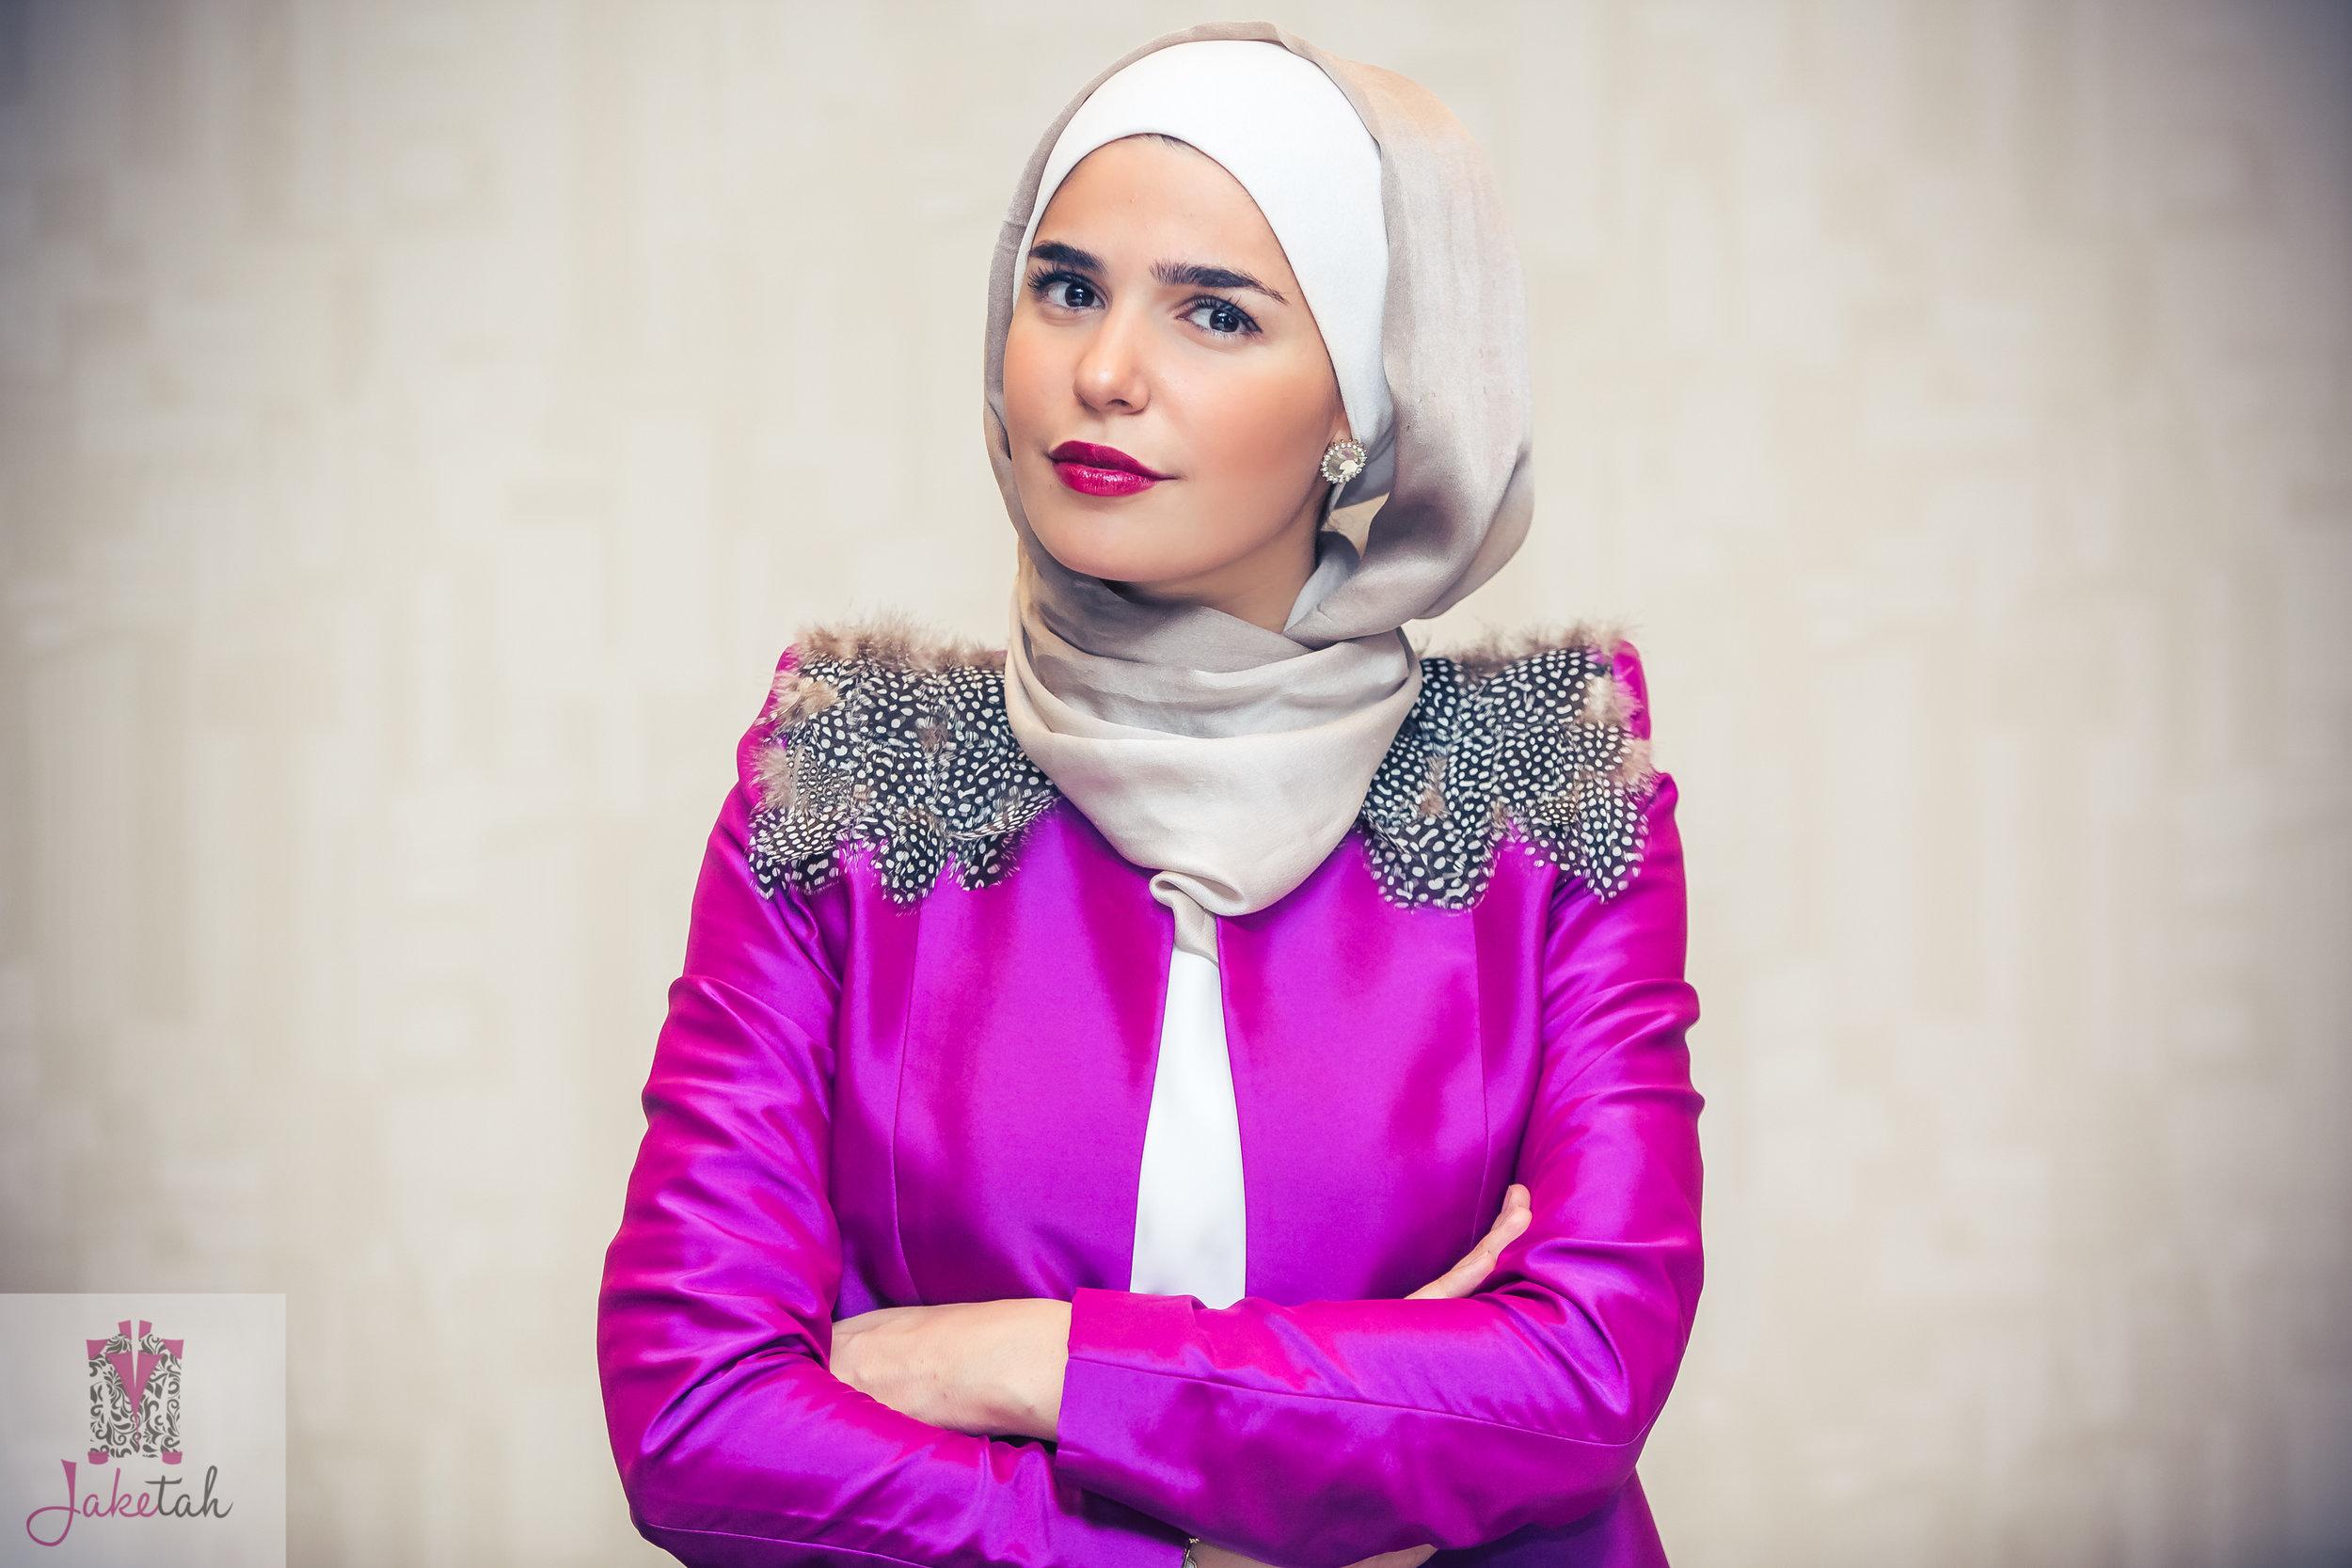 Rawan Besomi, photo courtesy of Jaketah